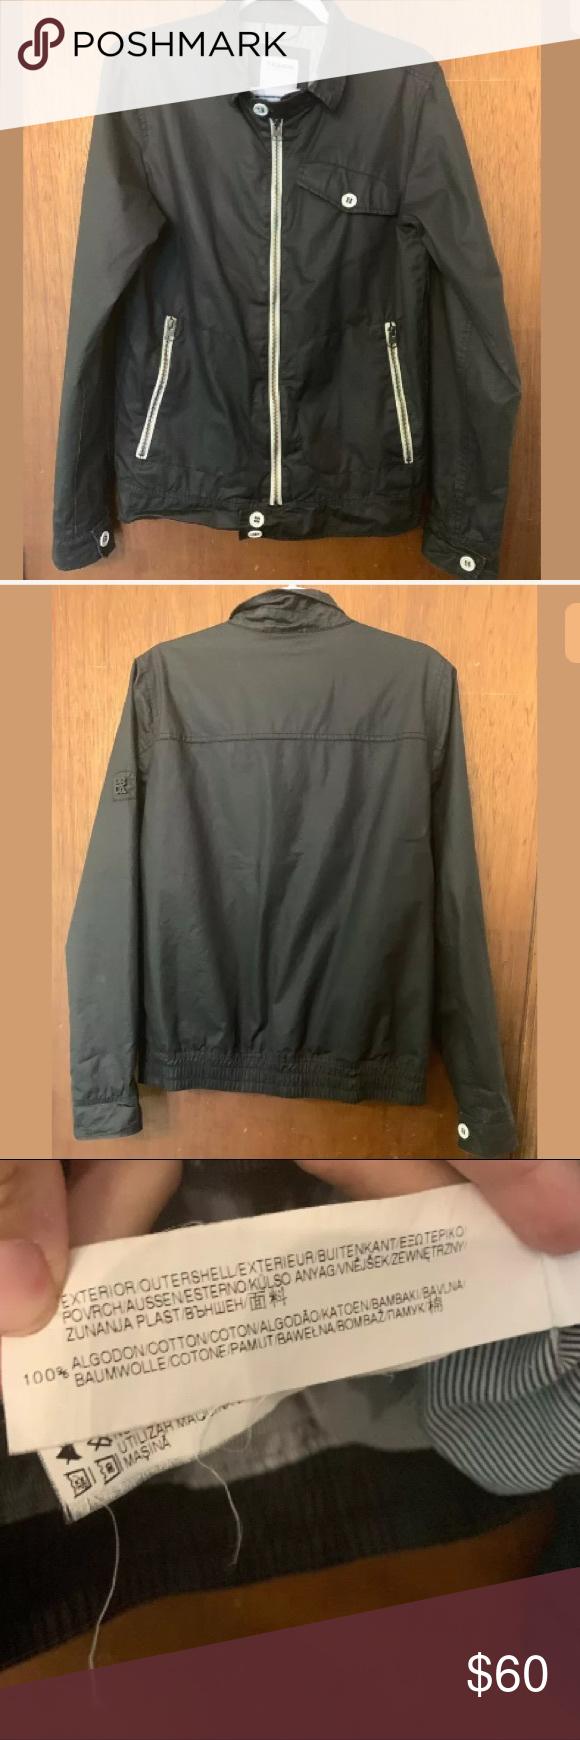 Pull Bear Black Zip Up Moto Waxed Cotton Jacket Waxed Cotton Jacket Black Zip Ups Waxed Cotton